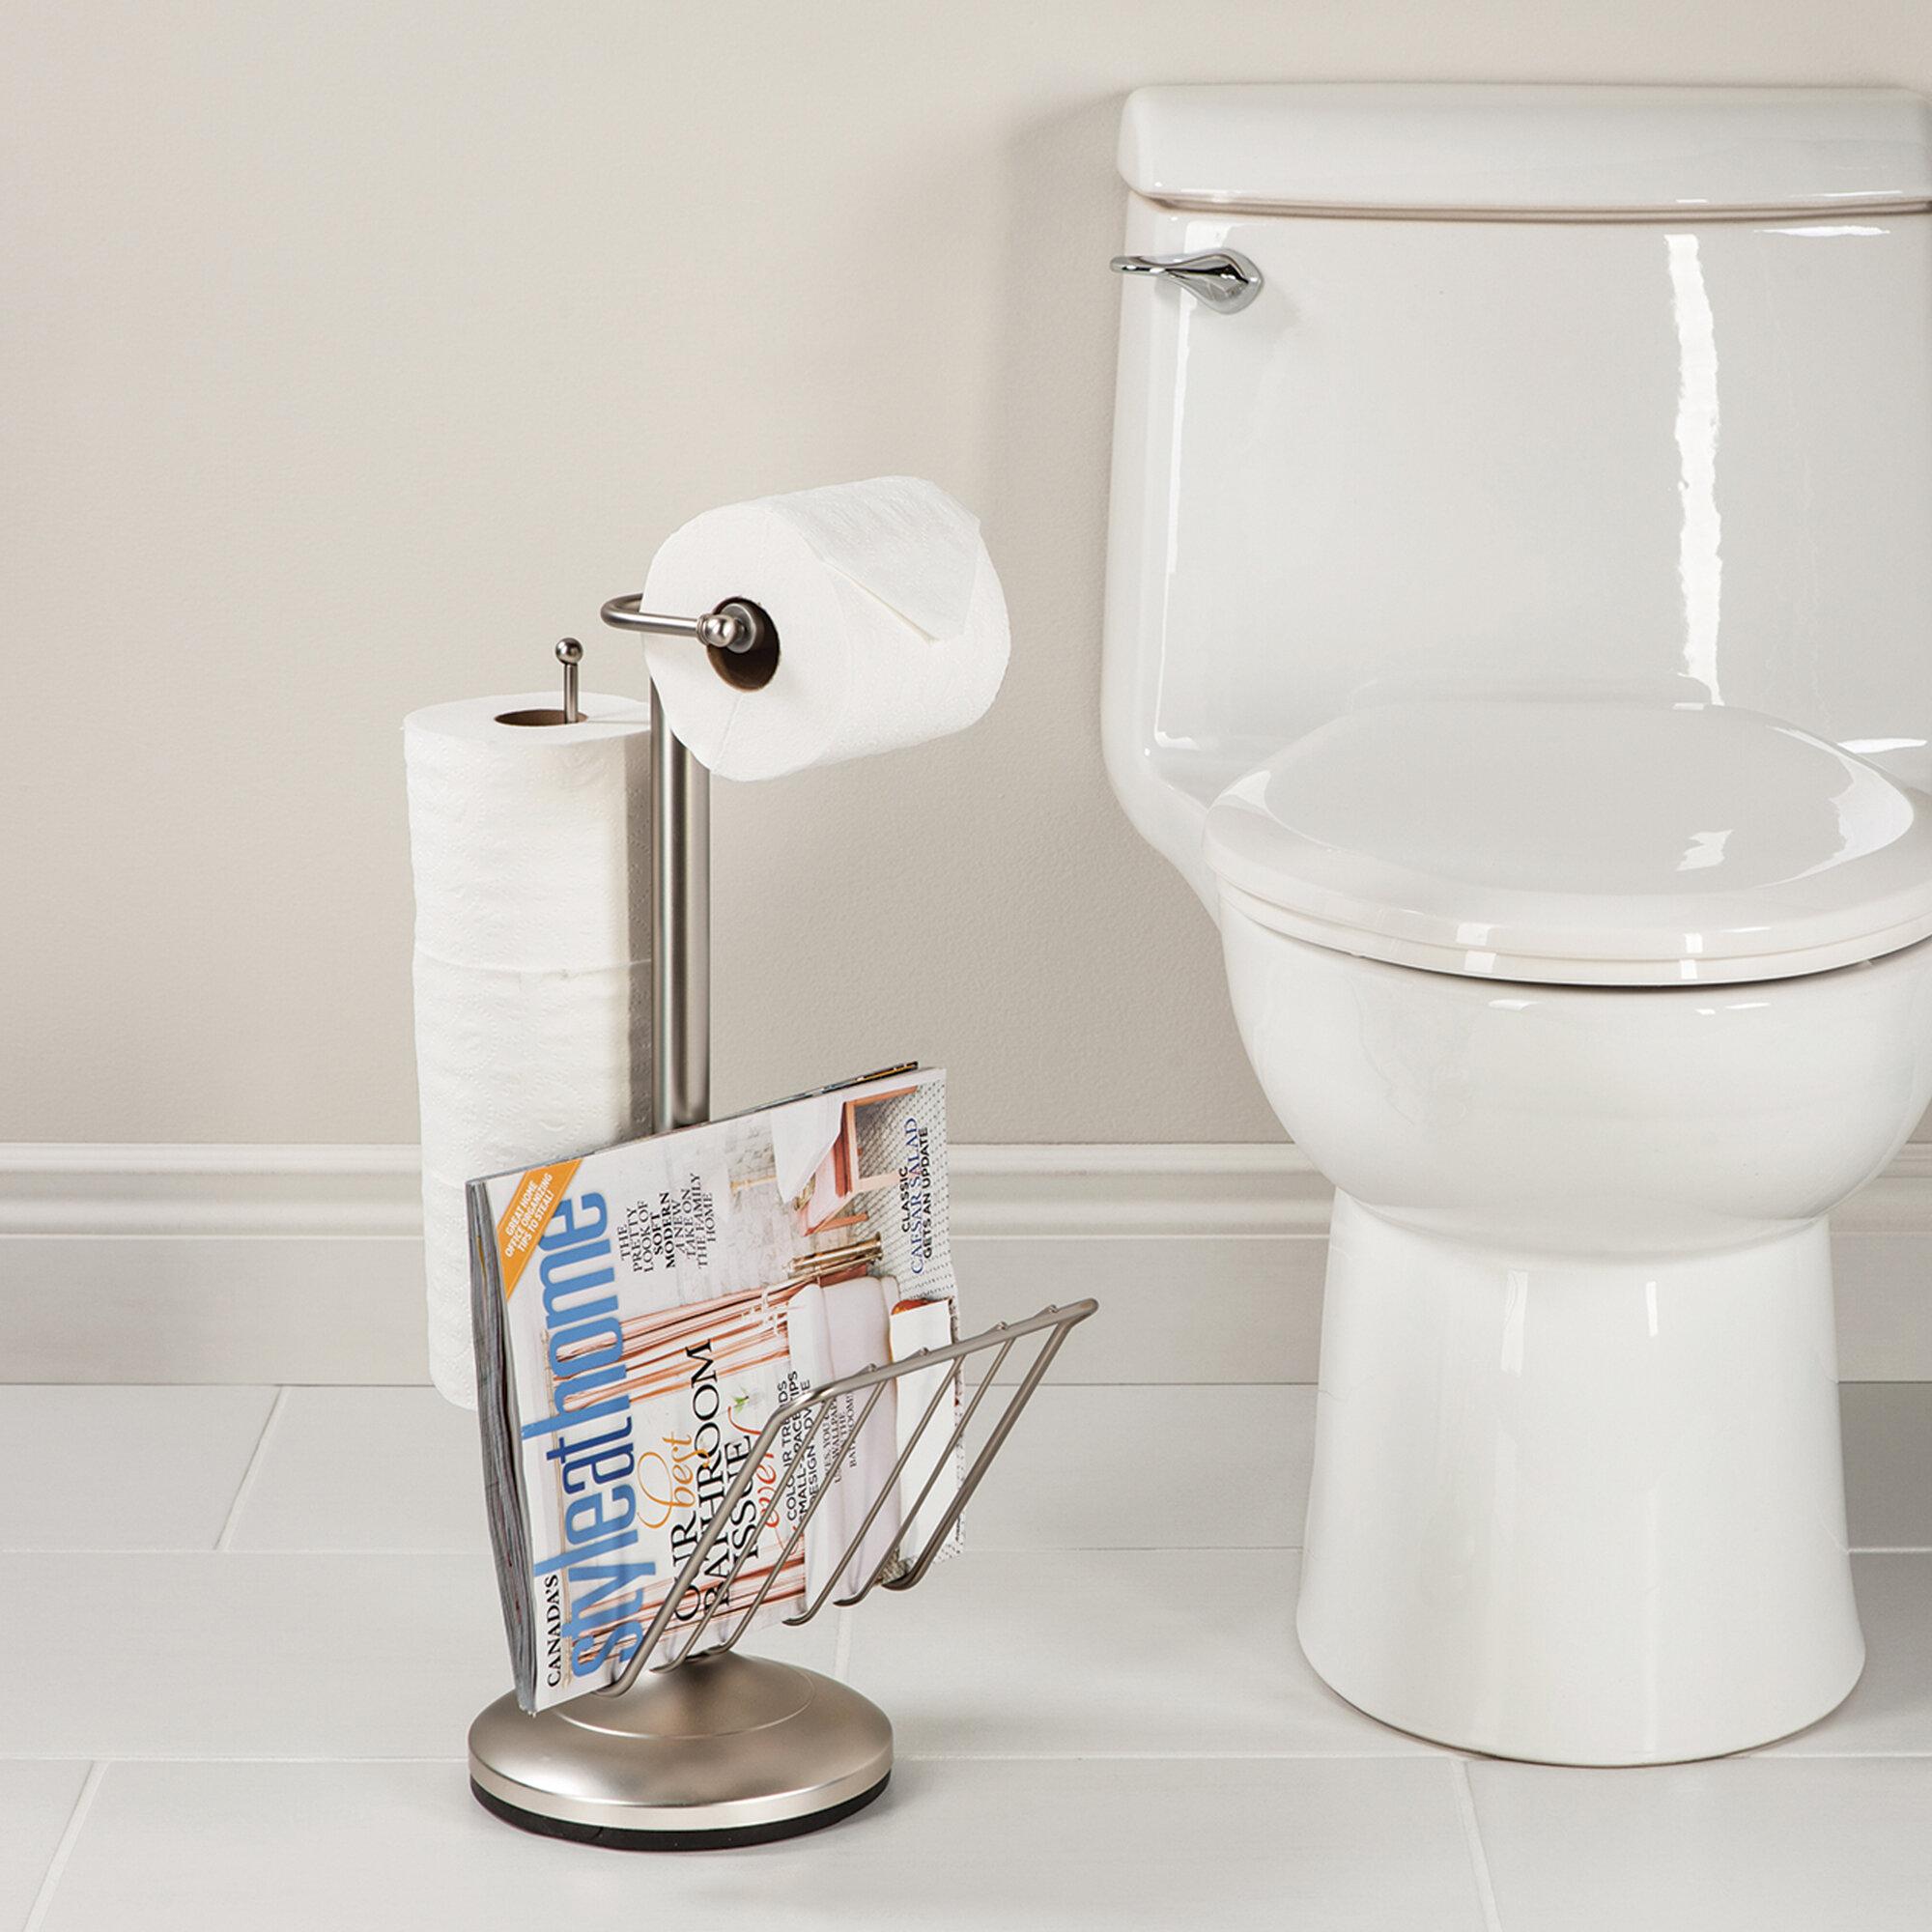 Home Office Toilet Bathroom Magazine Holder Rack Stand Newspaper Storage Chrome